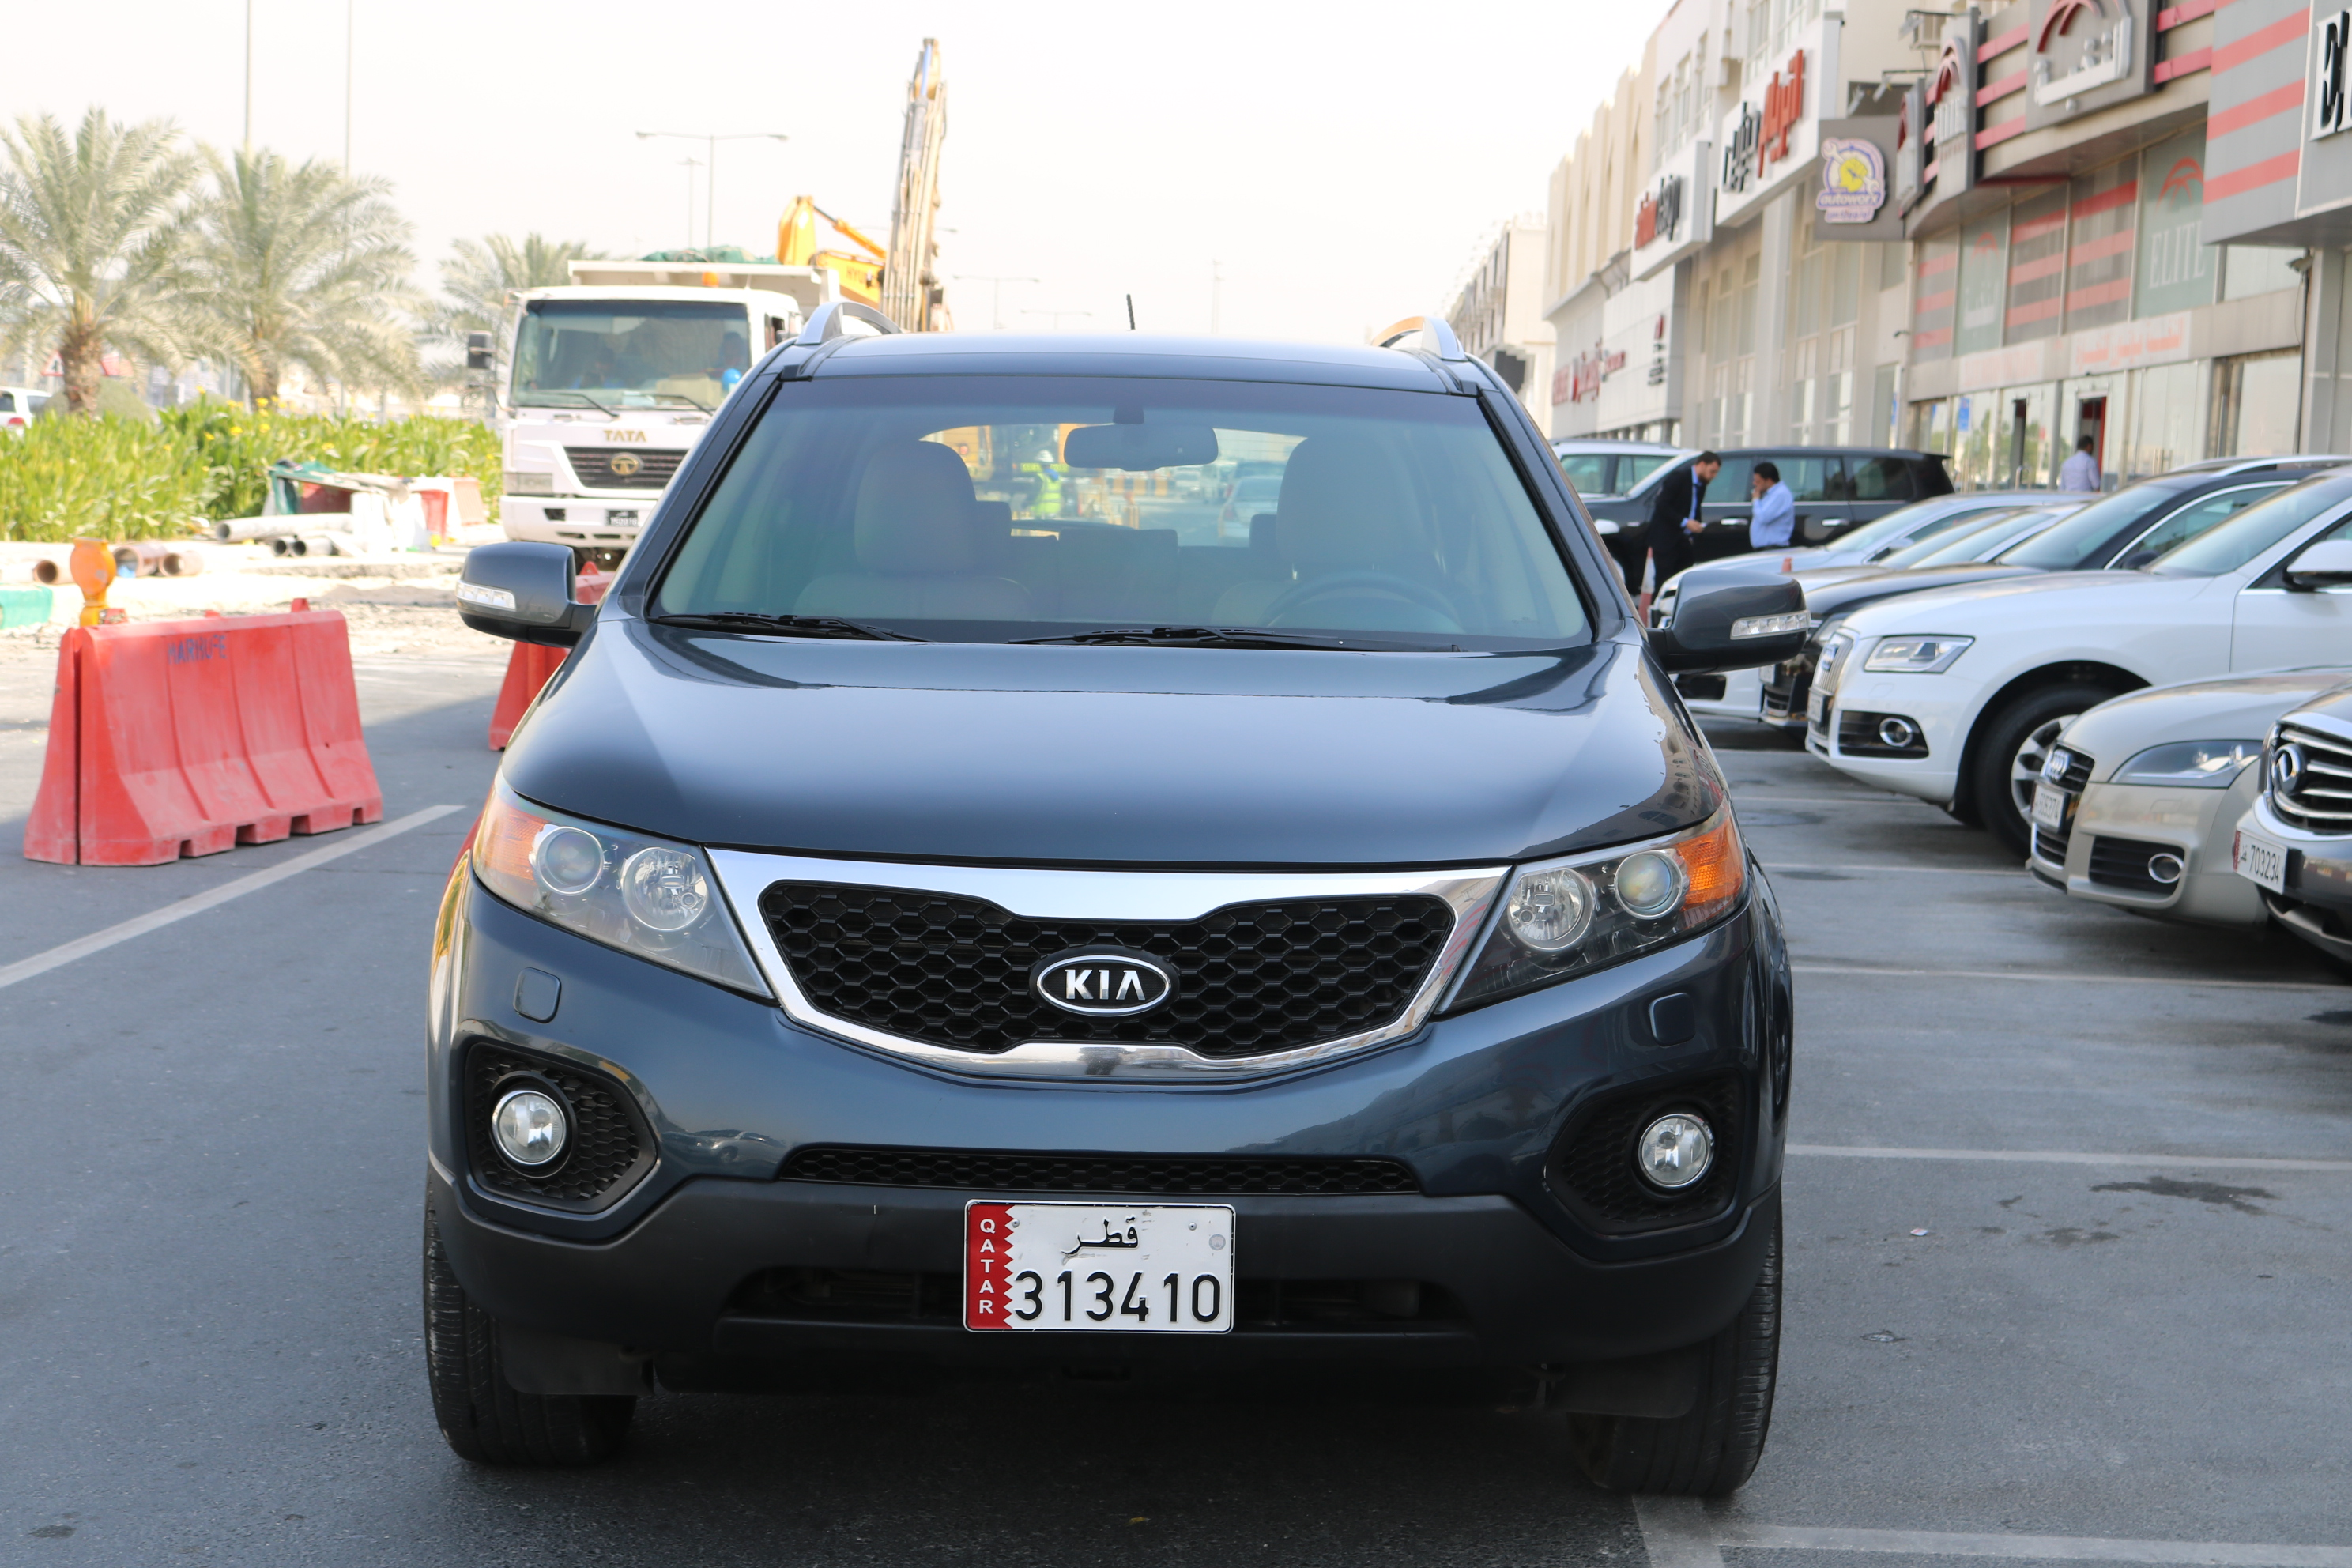 Used Kia Sorento 2011 Car For Sale In Doha 714365 Yallamotor Com